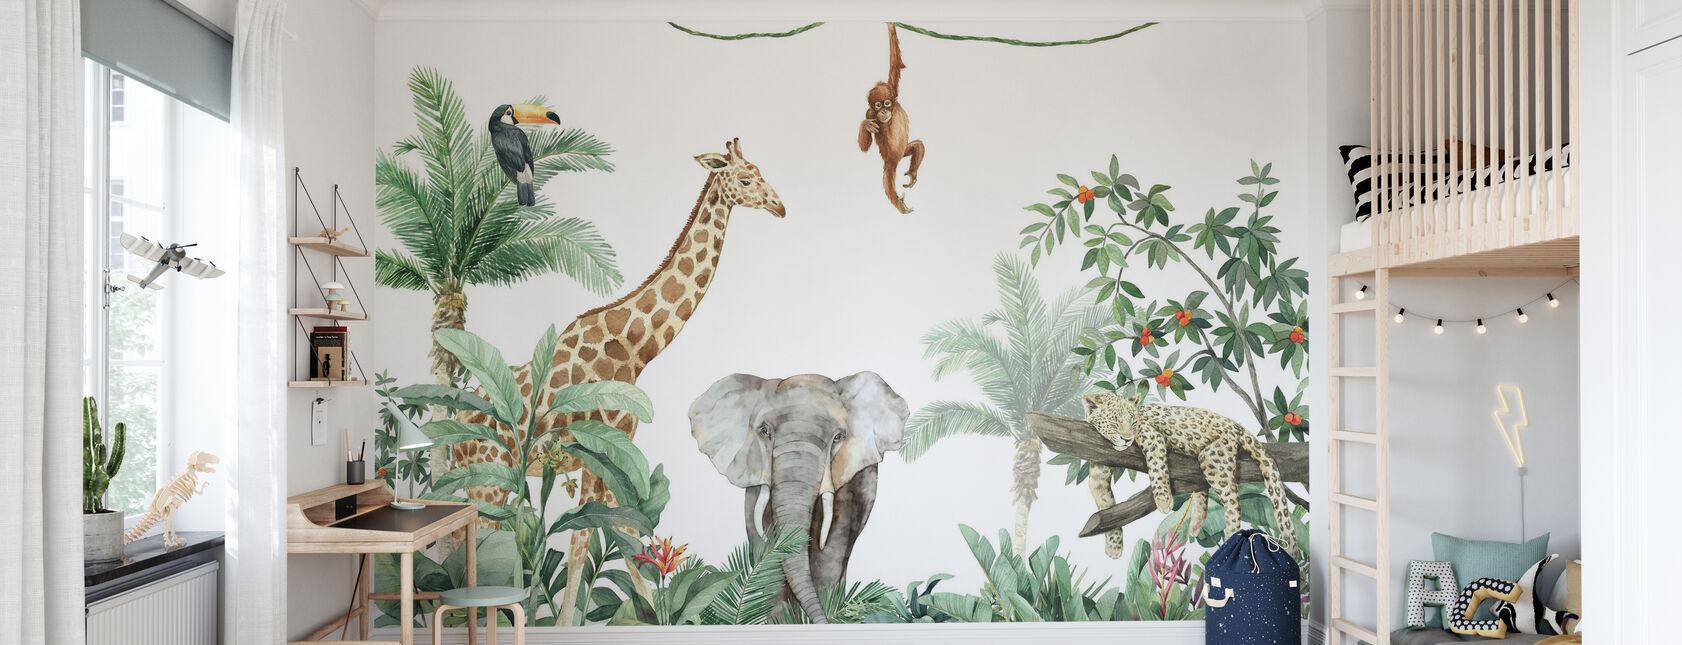 Jungle Friends met olifant - Behang - Kinderkamer